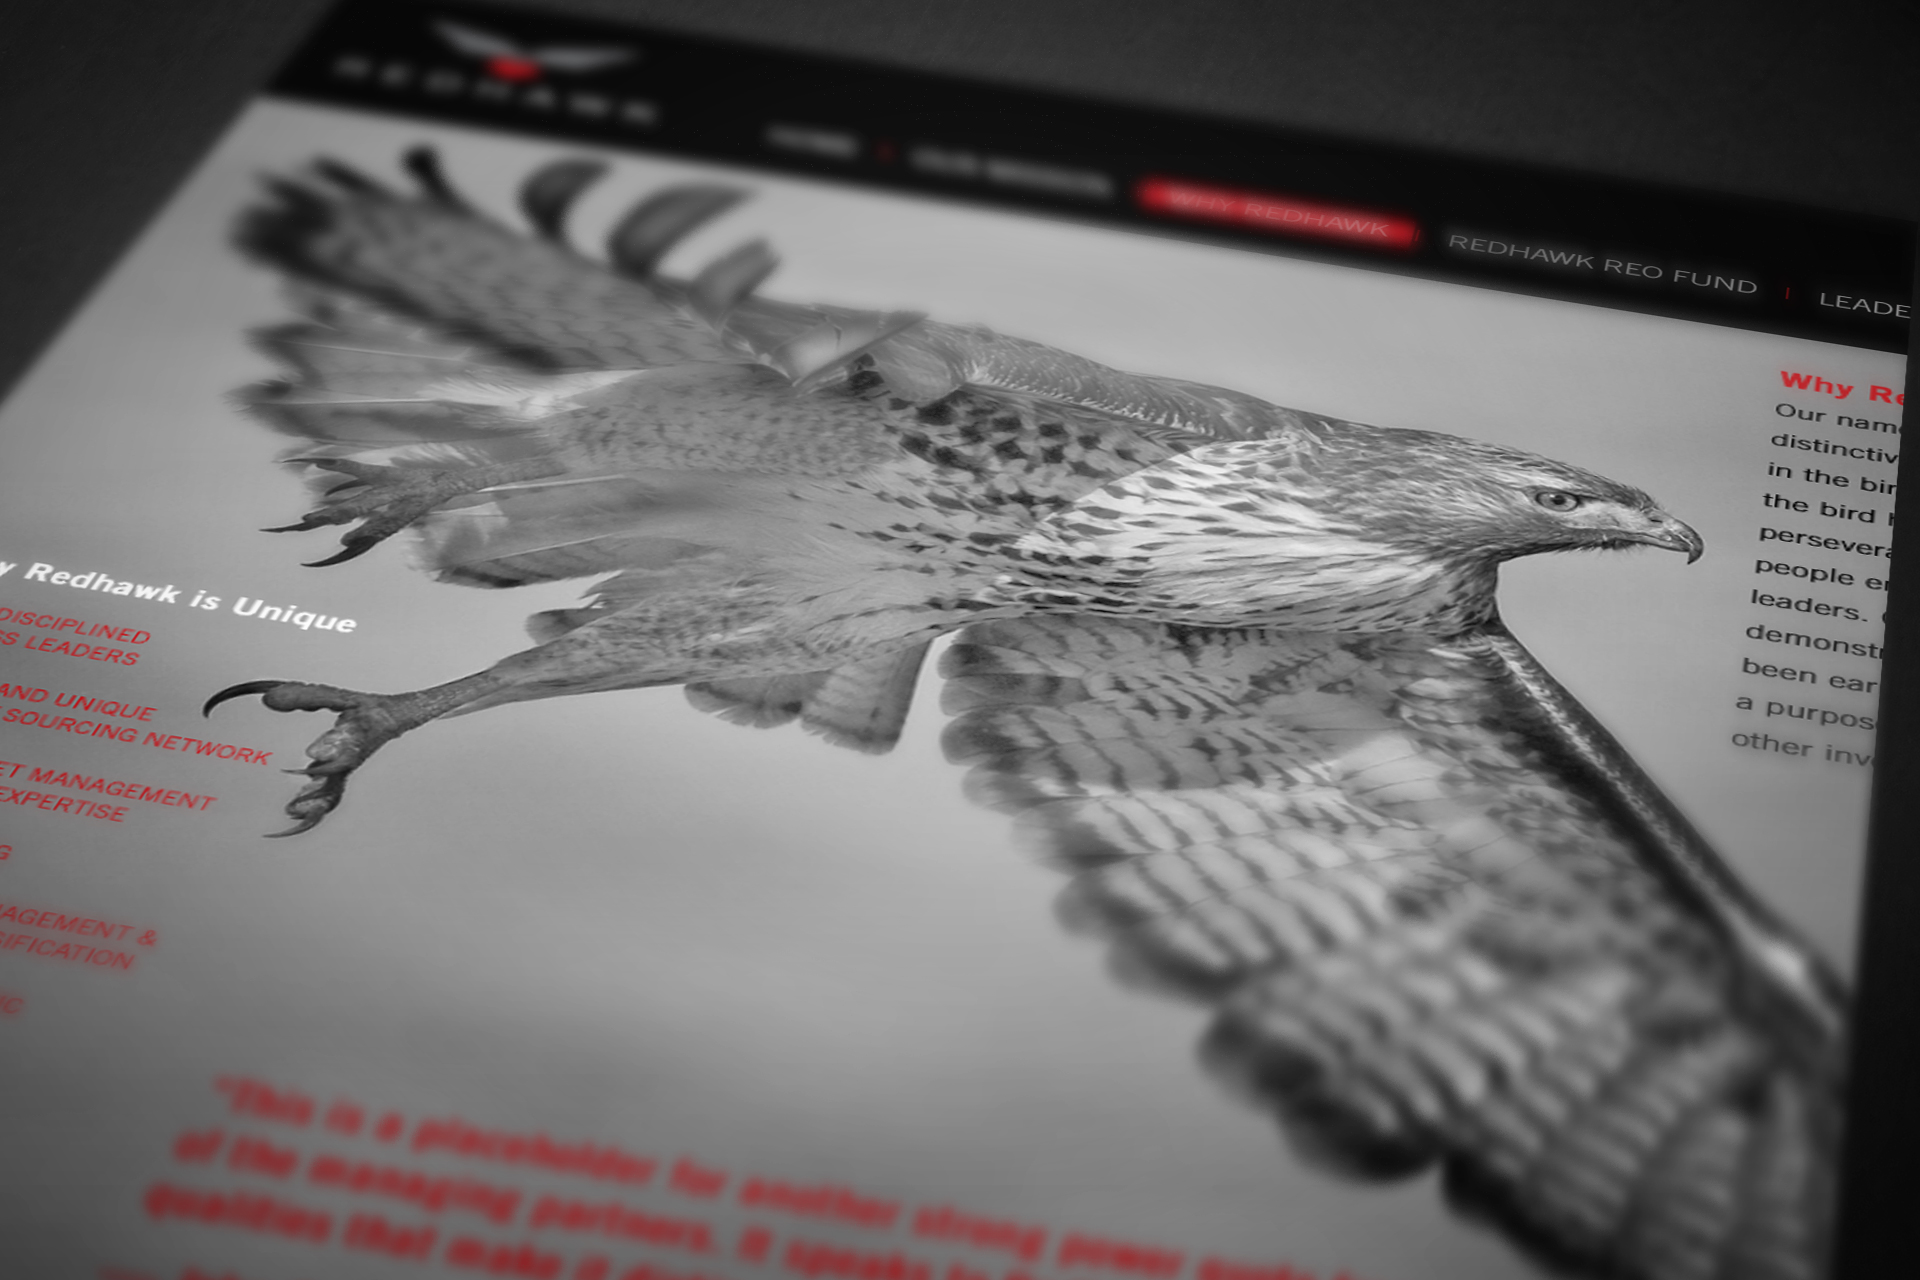 Redhawk-close-up-2